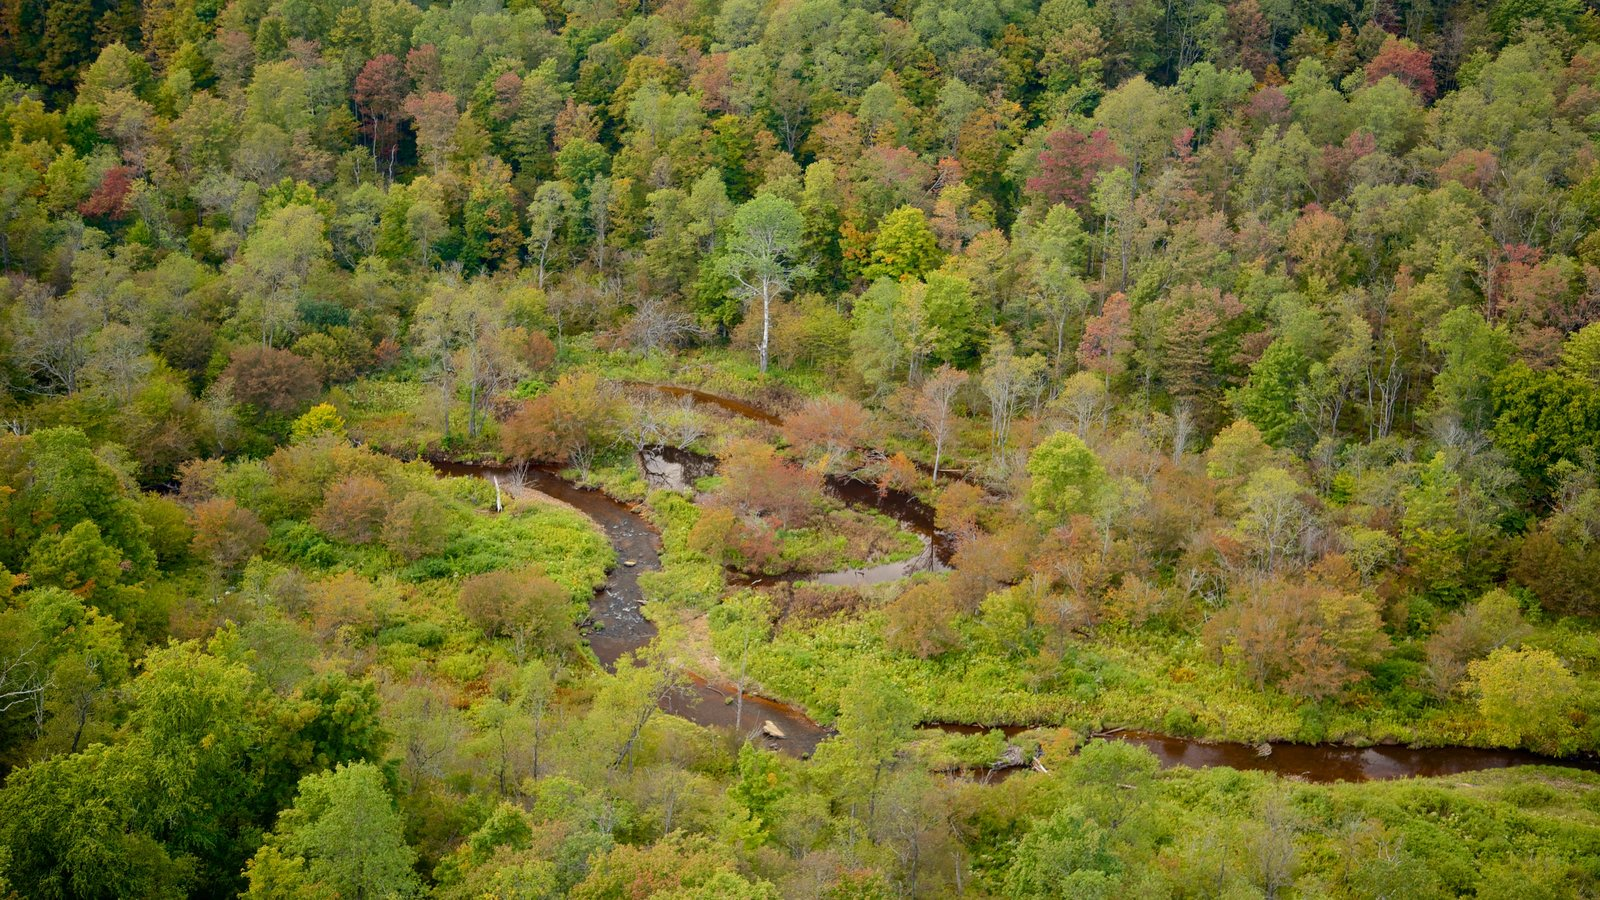 Noroeste de Pensilvânia caracterizando cenas de floresta e um rio ou córrego